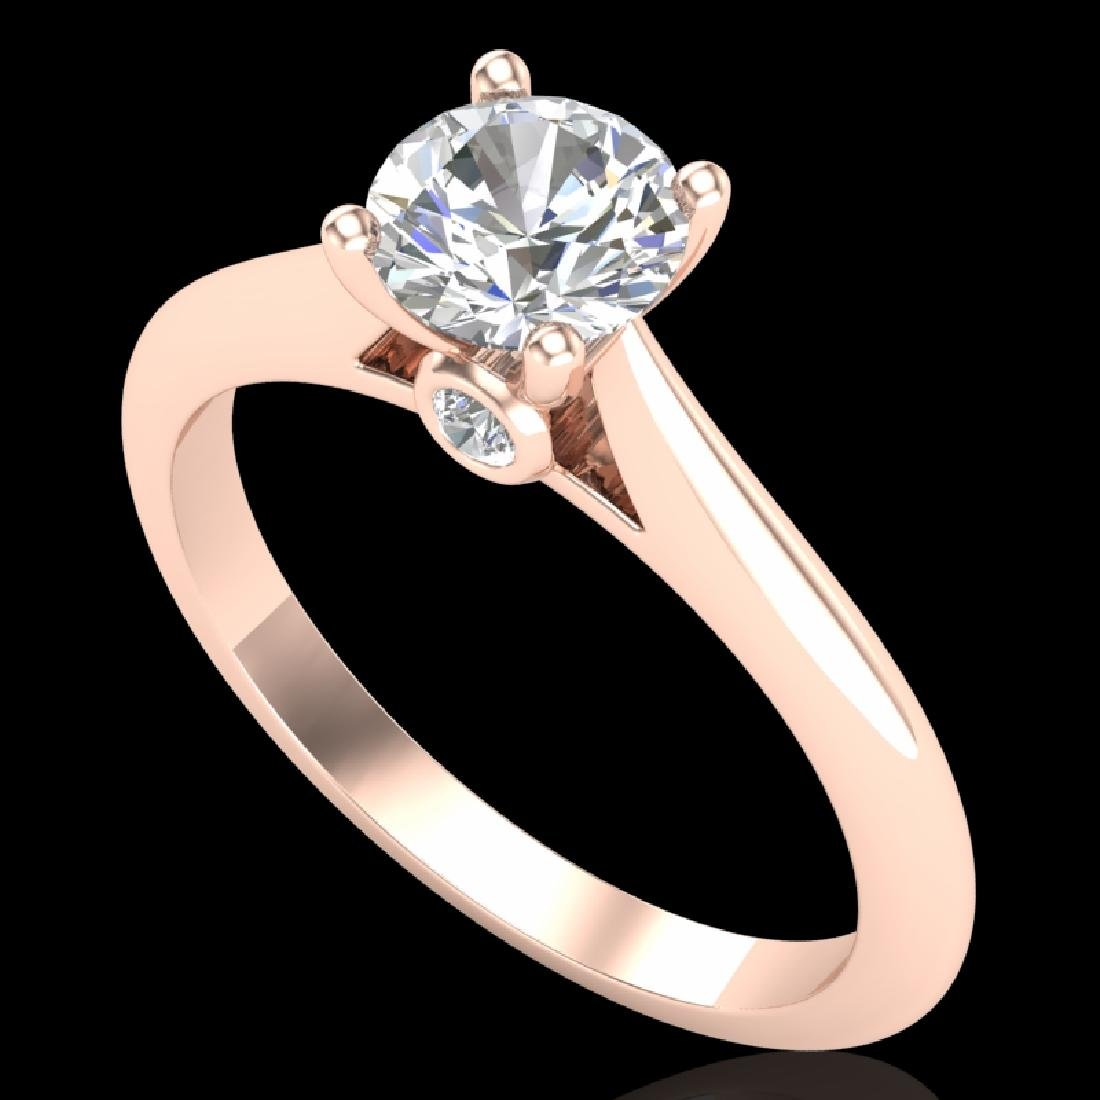 0.83 CTW VS/SI Diamond Solitaire Art Deco Ring 18K Rose